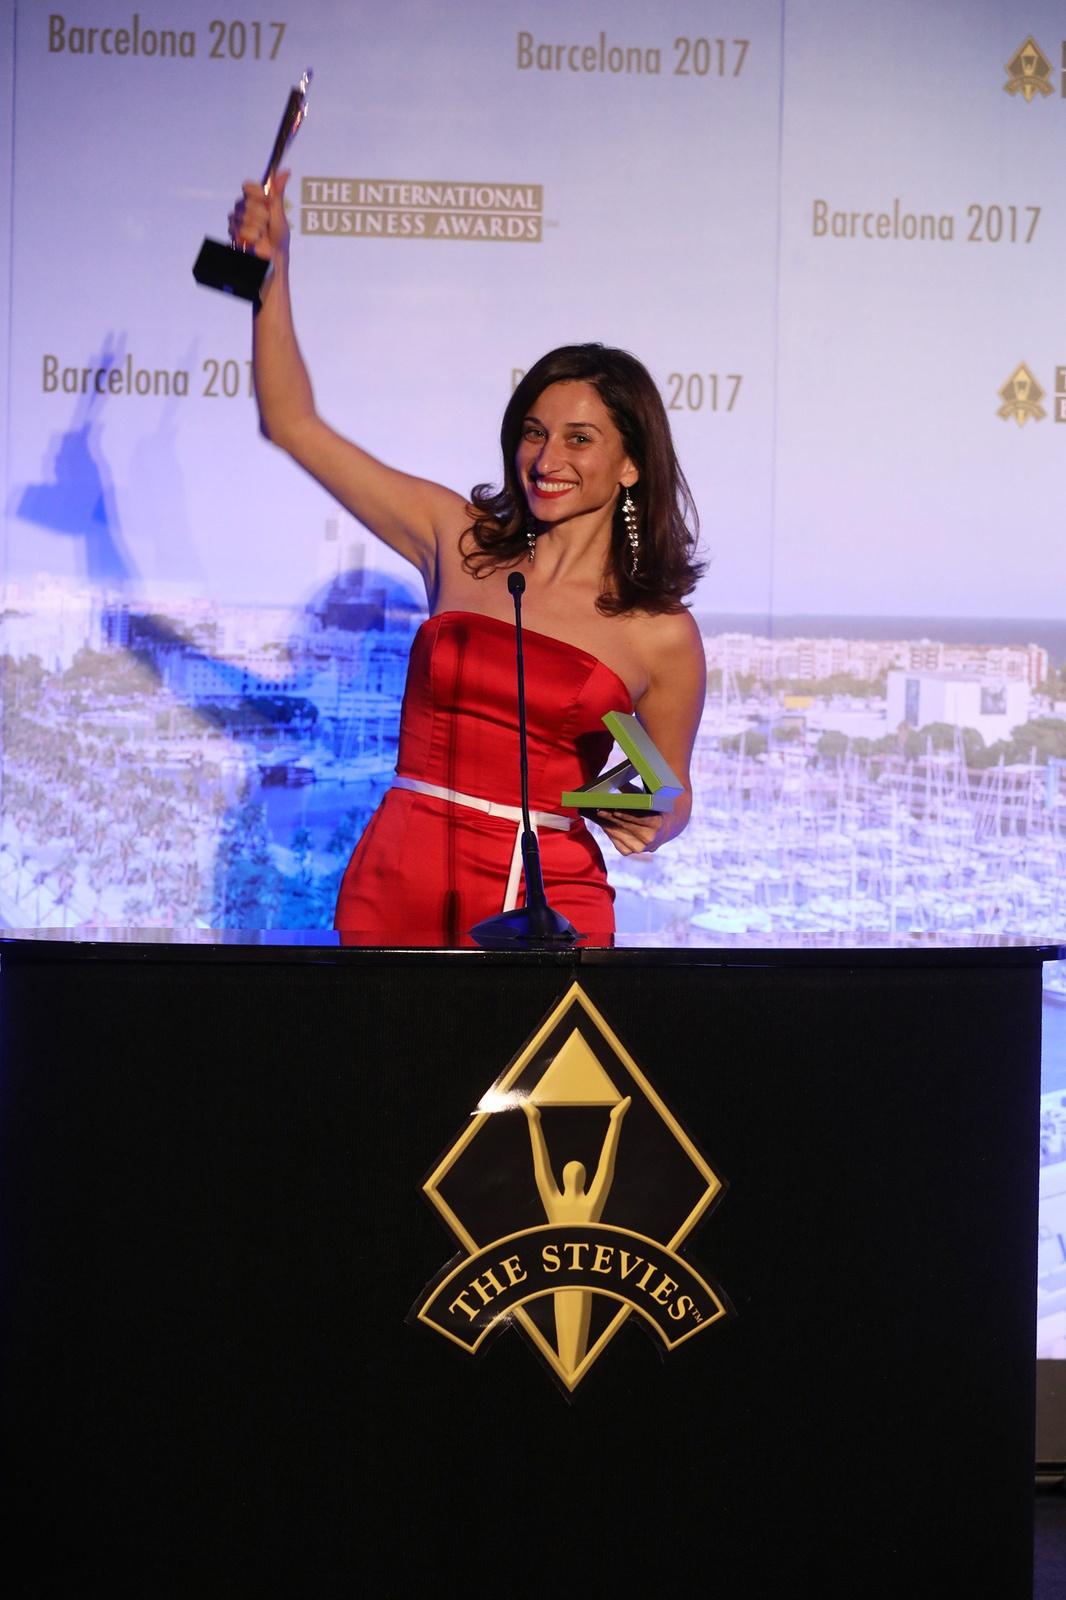 IBA winner woman 2017